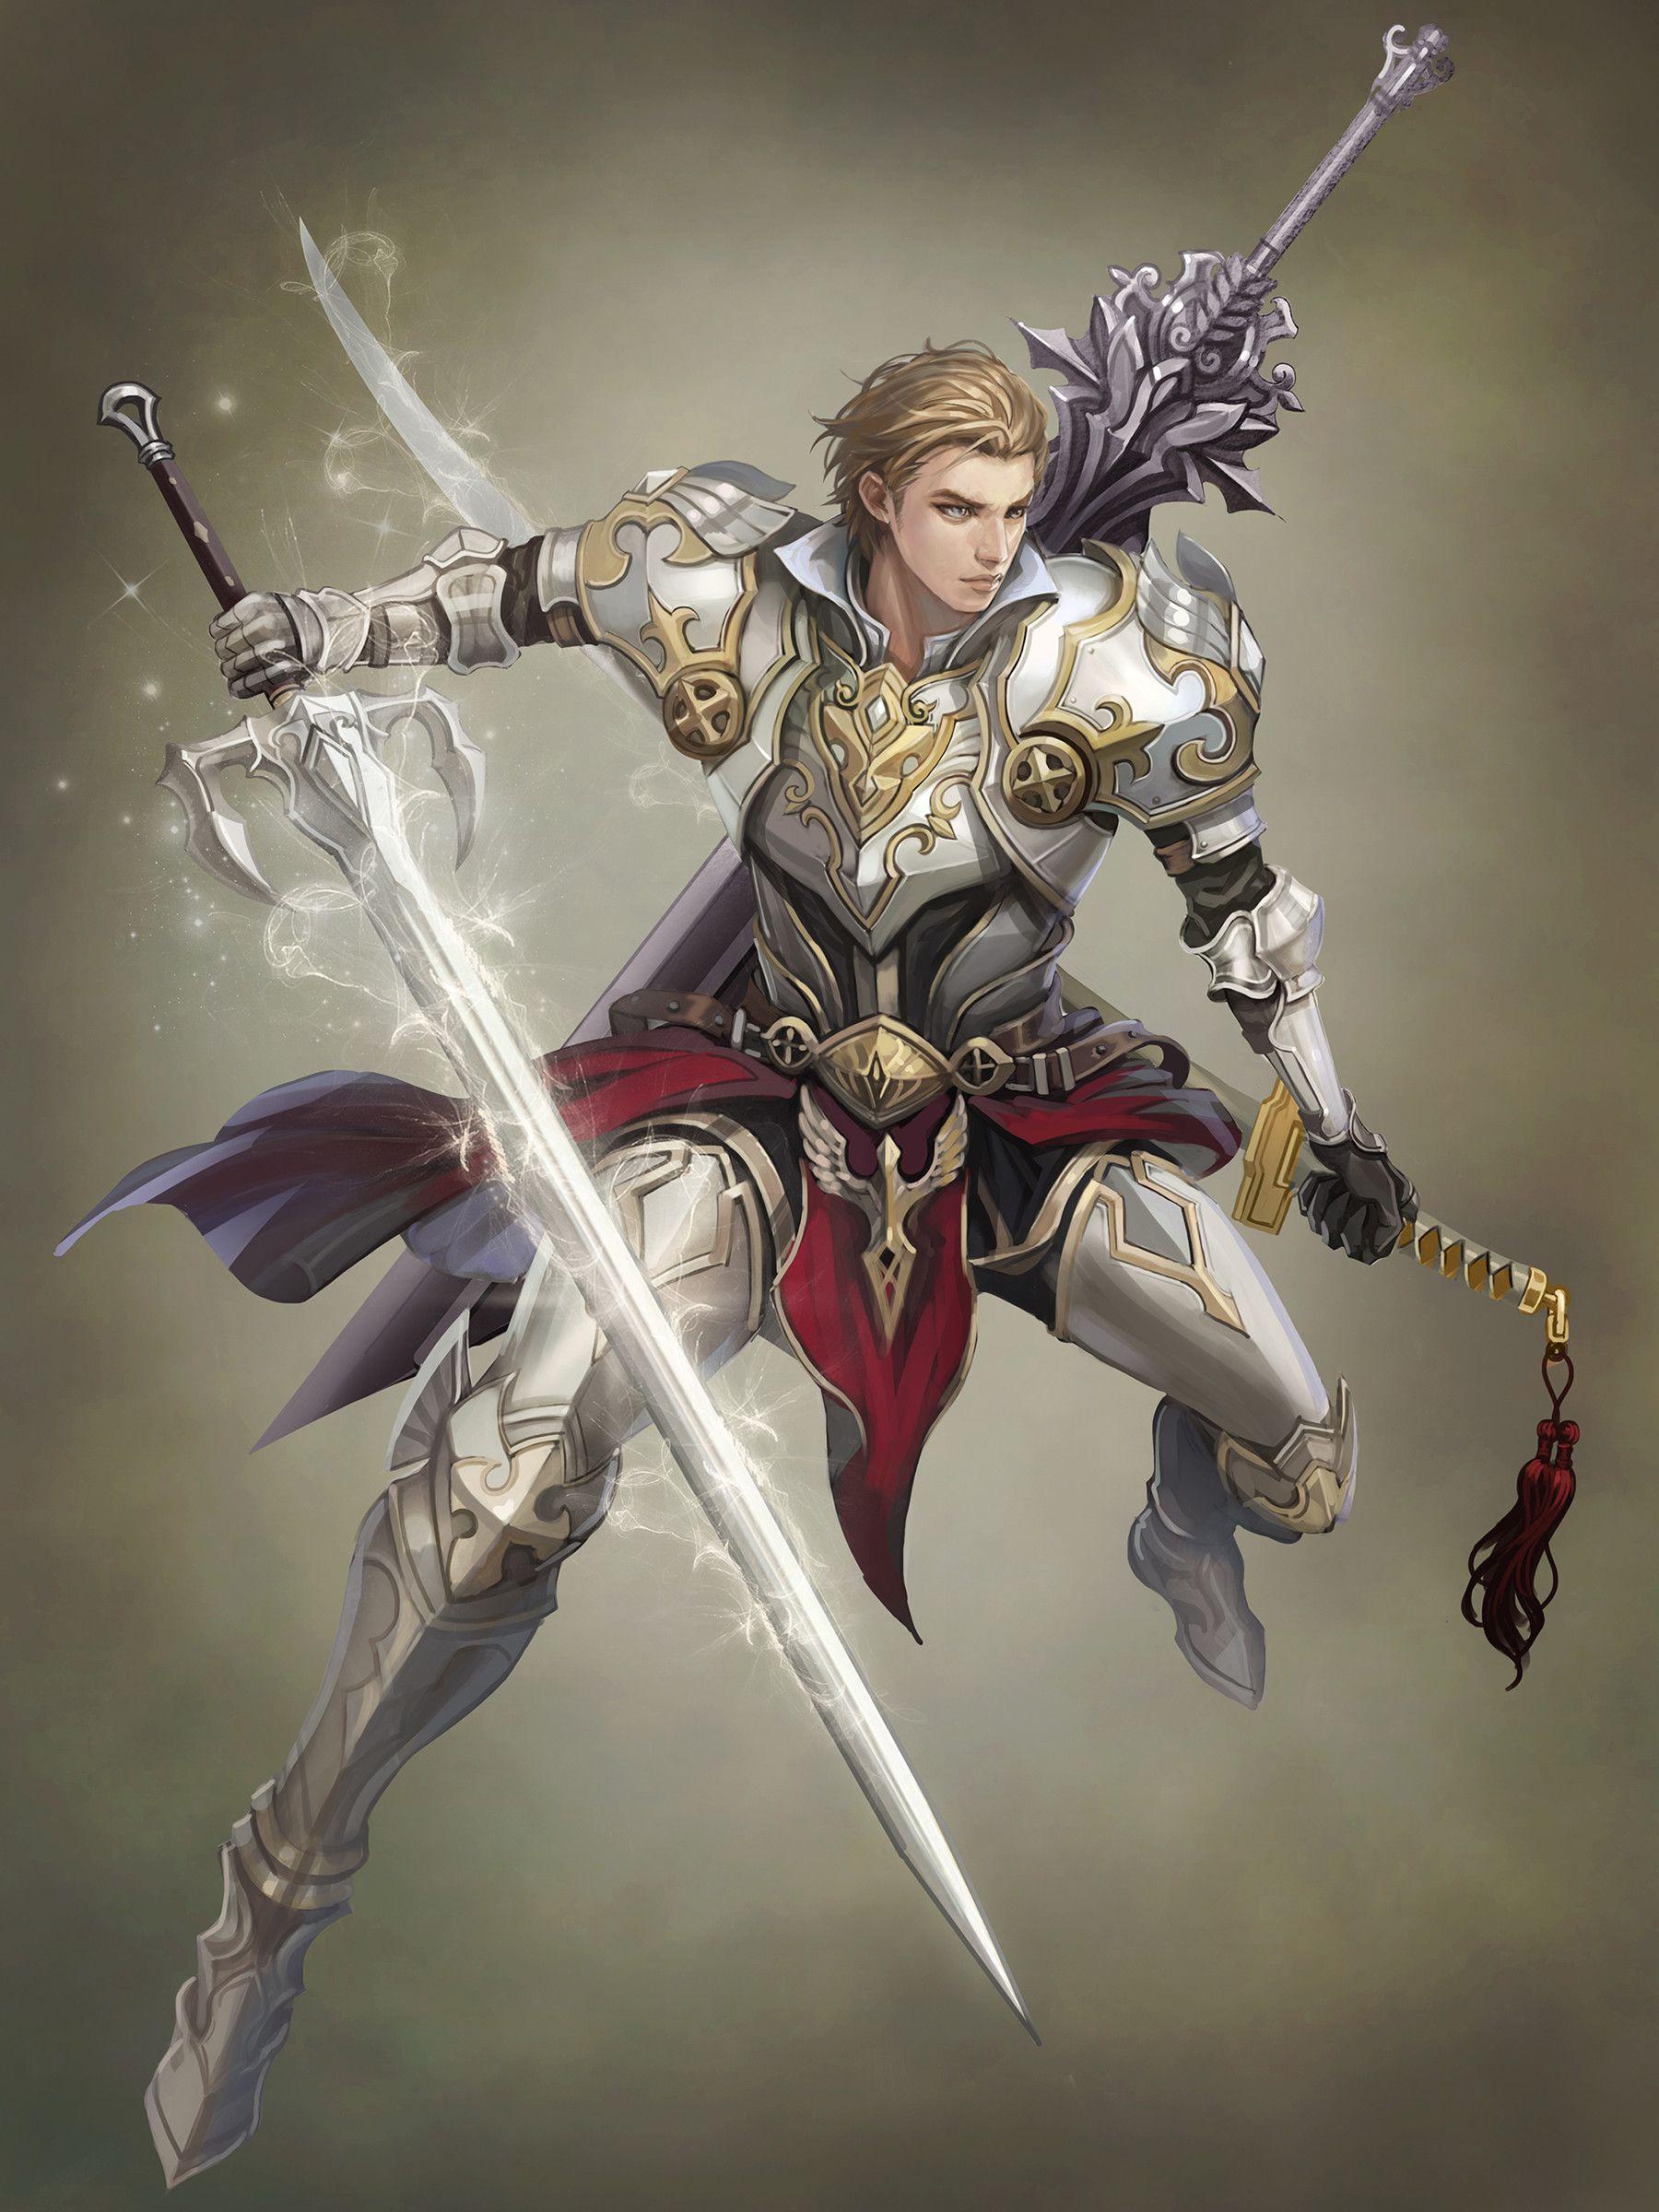 ArtStation - Sword master, Yunjae Kim